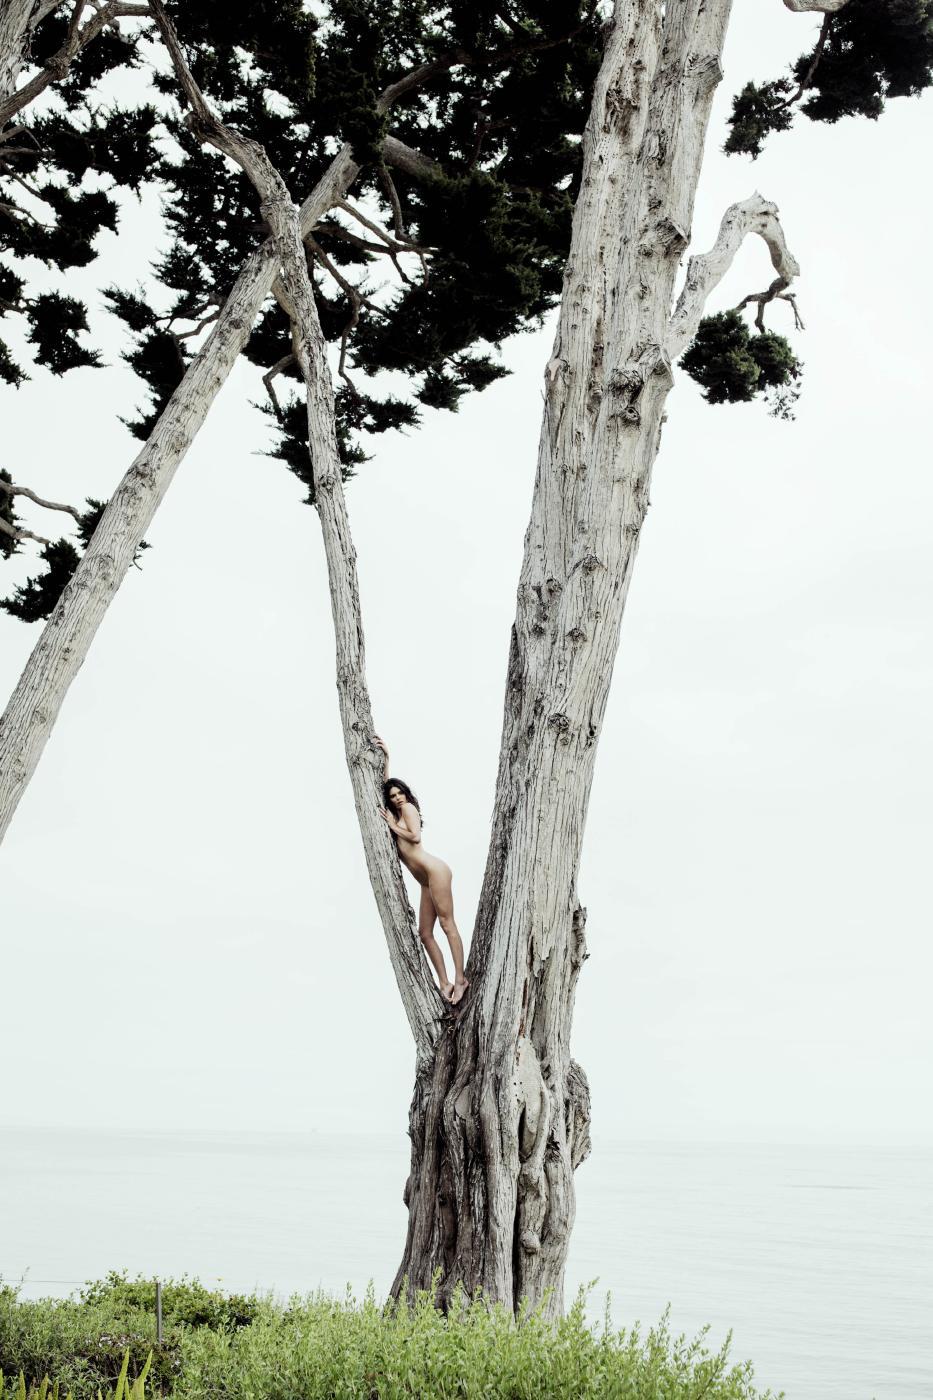 Kendall Jenner Nude Magazine Photoshoot Leaked Oimtow